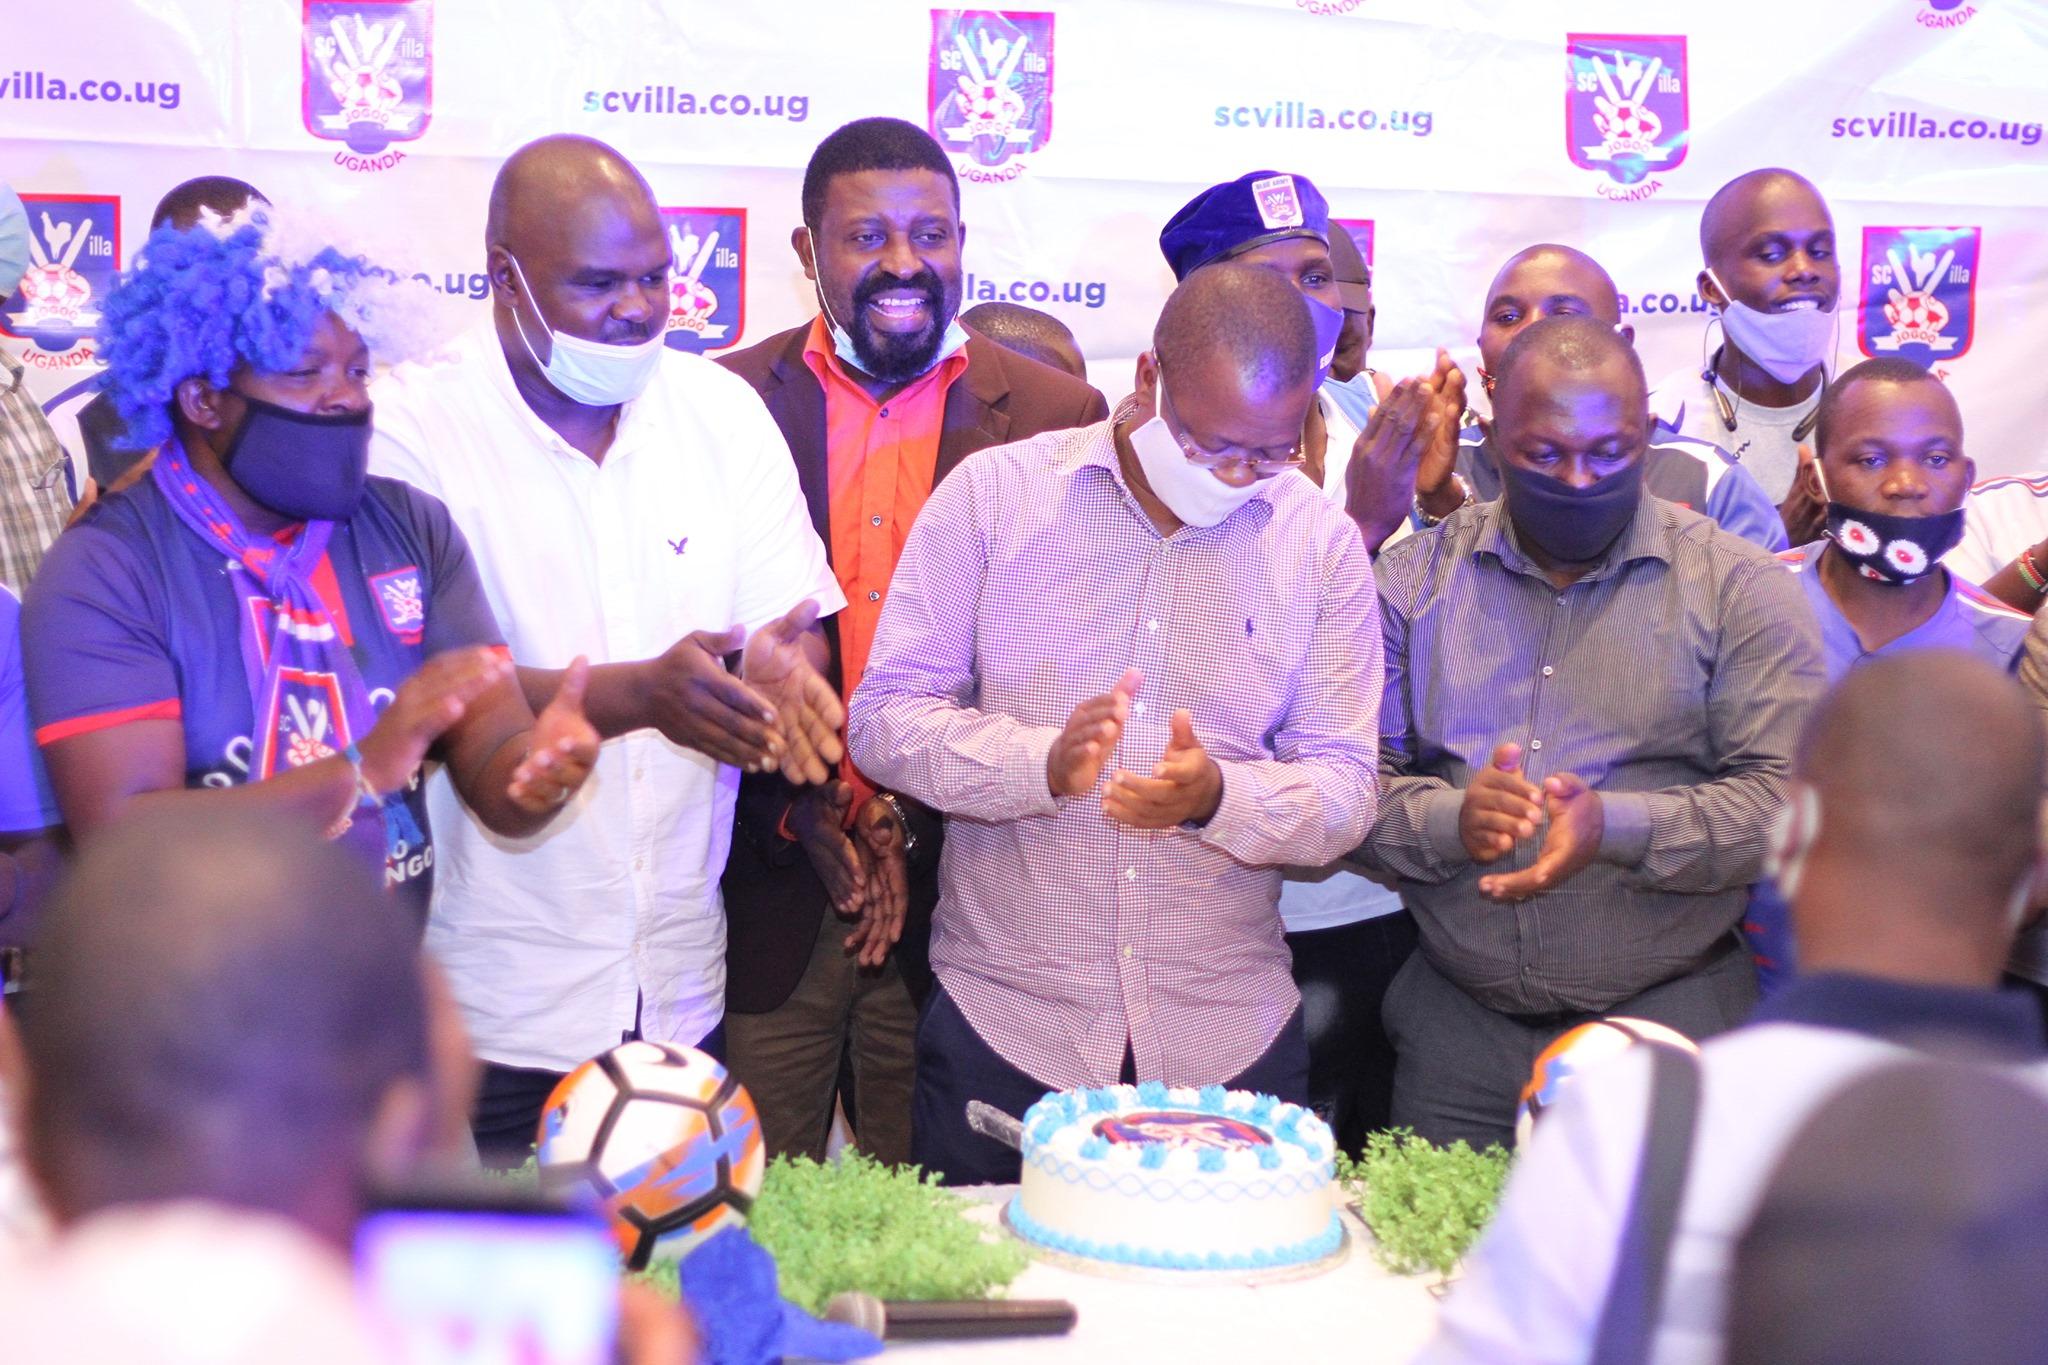 Hundreds, including FUFA boss Magogo join SC Villa's Members' Trust on day one of registration